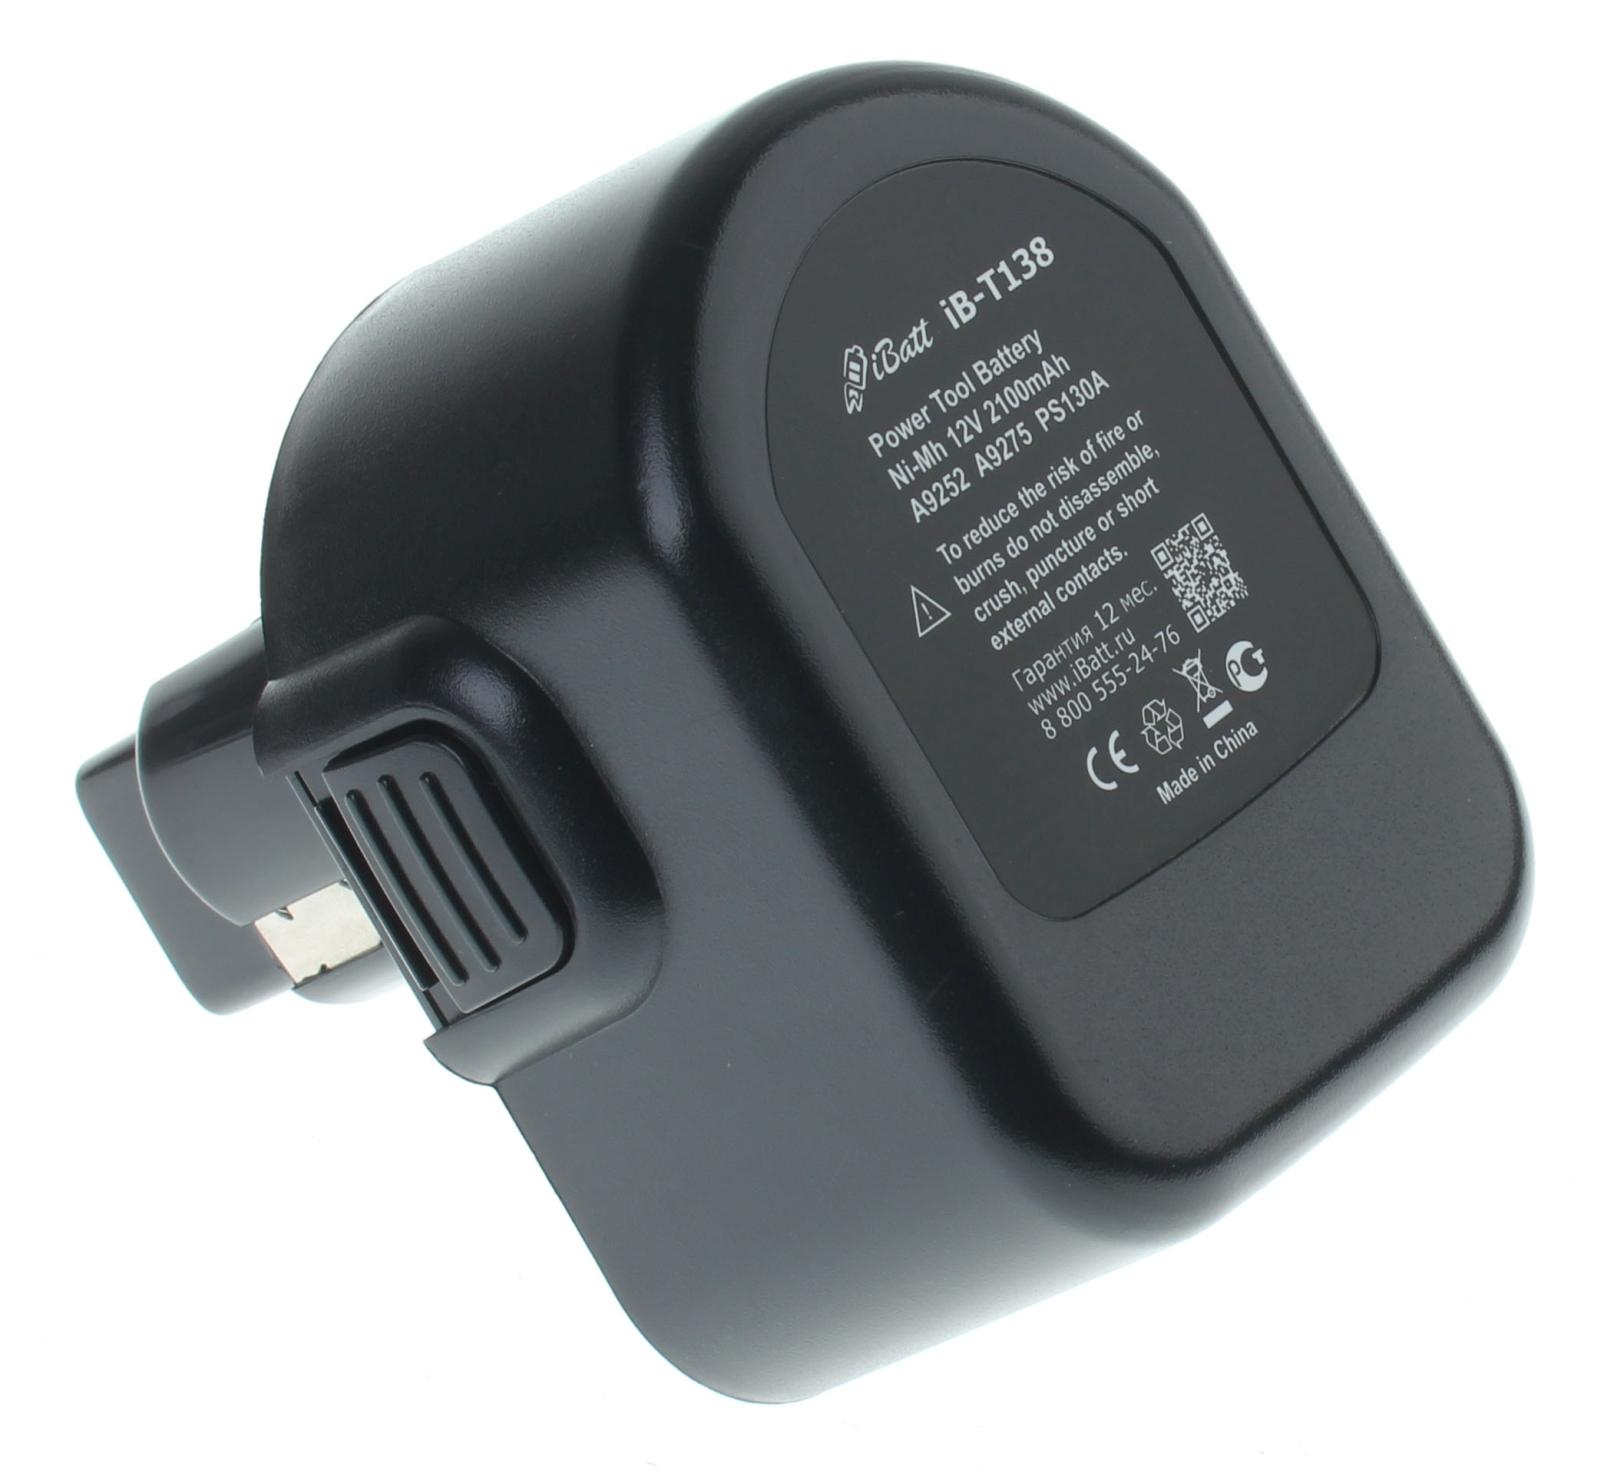 Аккумуляторная батарея A9252 для электроинструмента Black & Decker. Артикул iB-T138.Емкость (mAh): 2100. Напряжение (V): 12